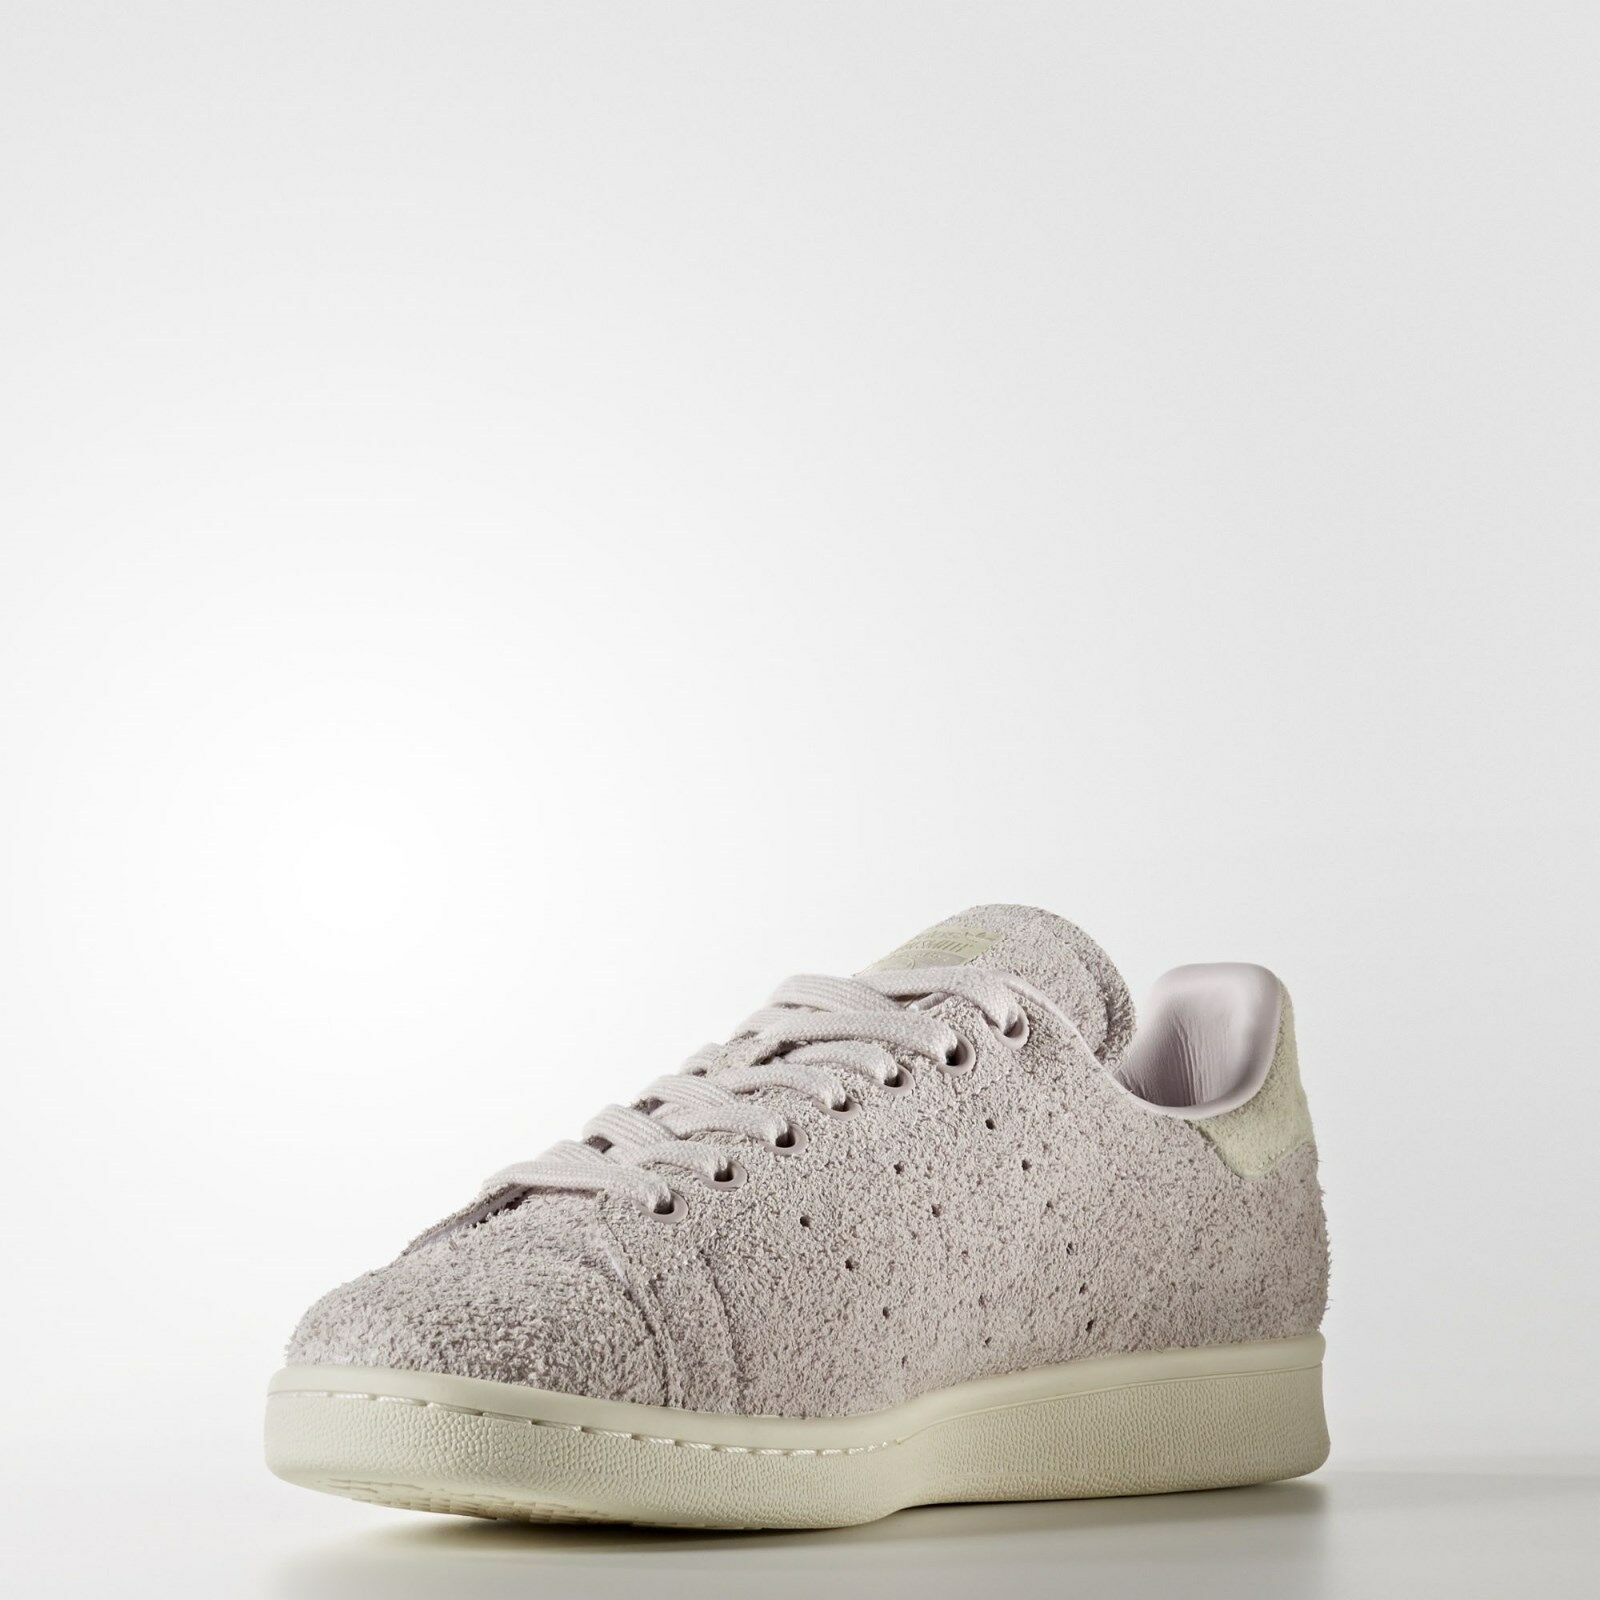 Adidas Originals Women's Stan Smith shoes Size 6 us S82258